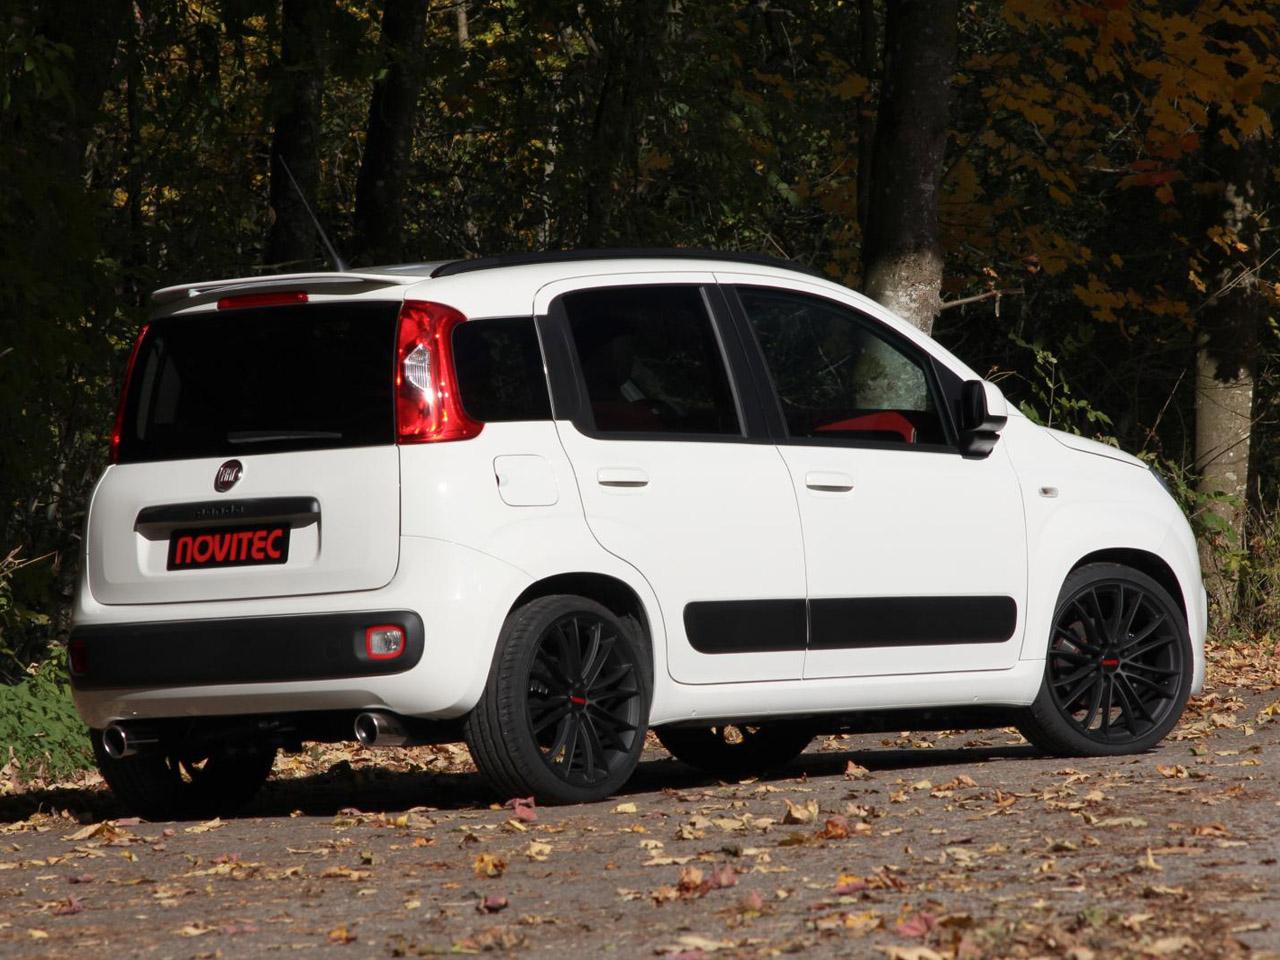 Fiat Panda 2012 Novitec